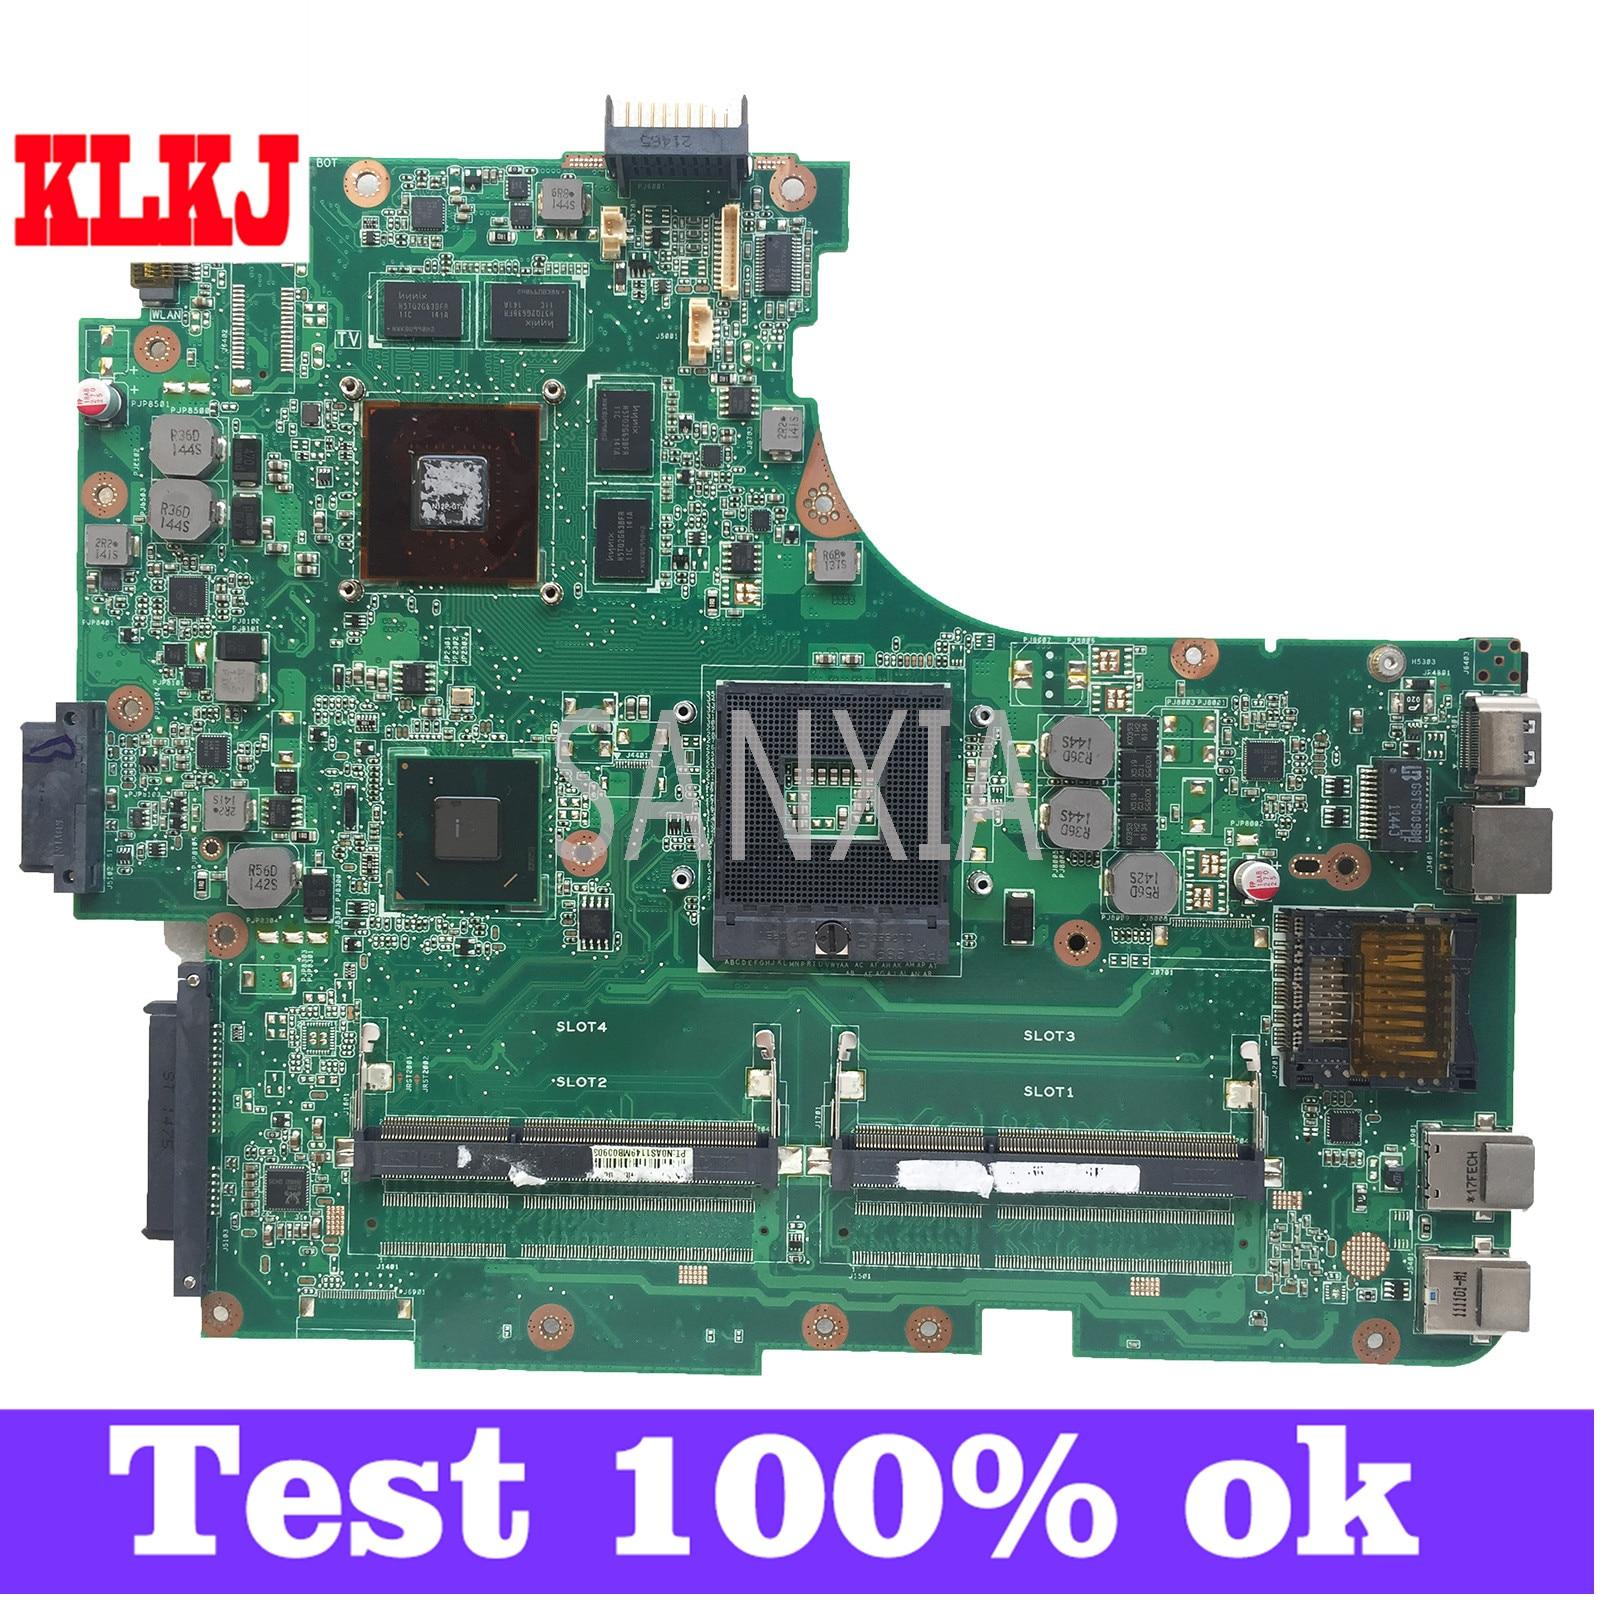 KLKJ N53SV اللوحة الأم لأجهزة الكمبيوتر المحمول ASUS N53SM N53SN N53S اللوحة الرئيسية الأصلية GT630M-2GB